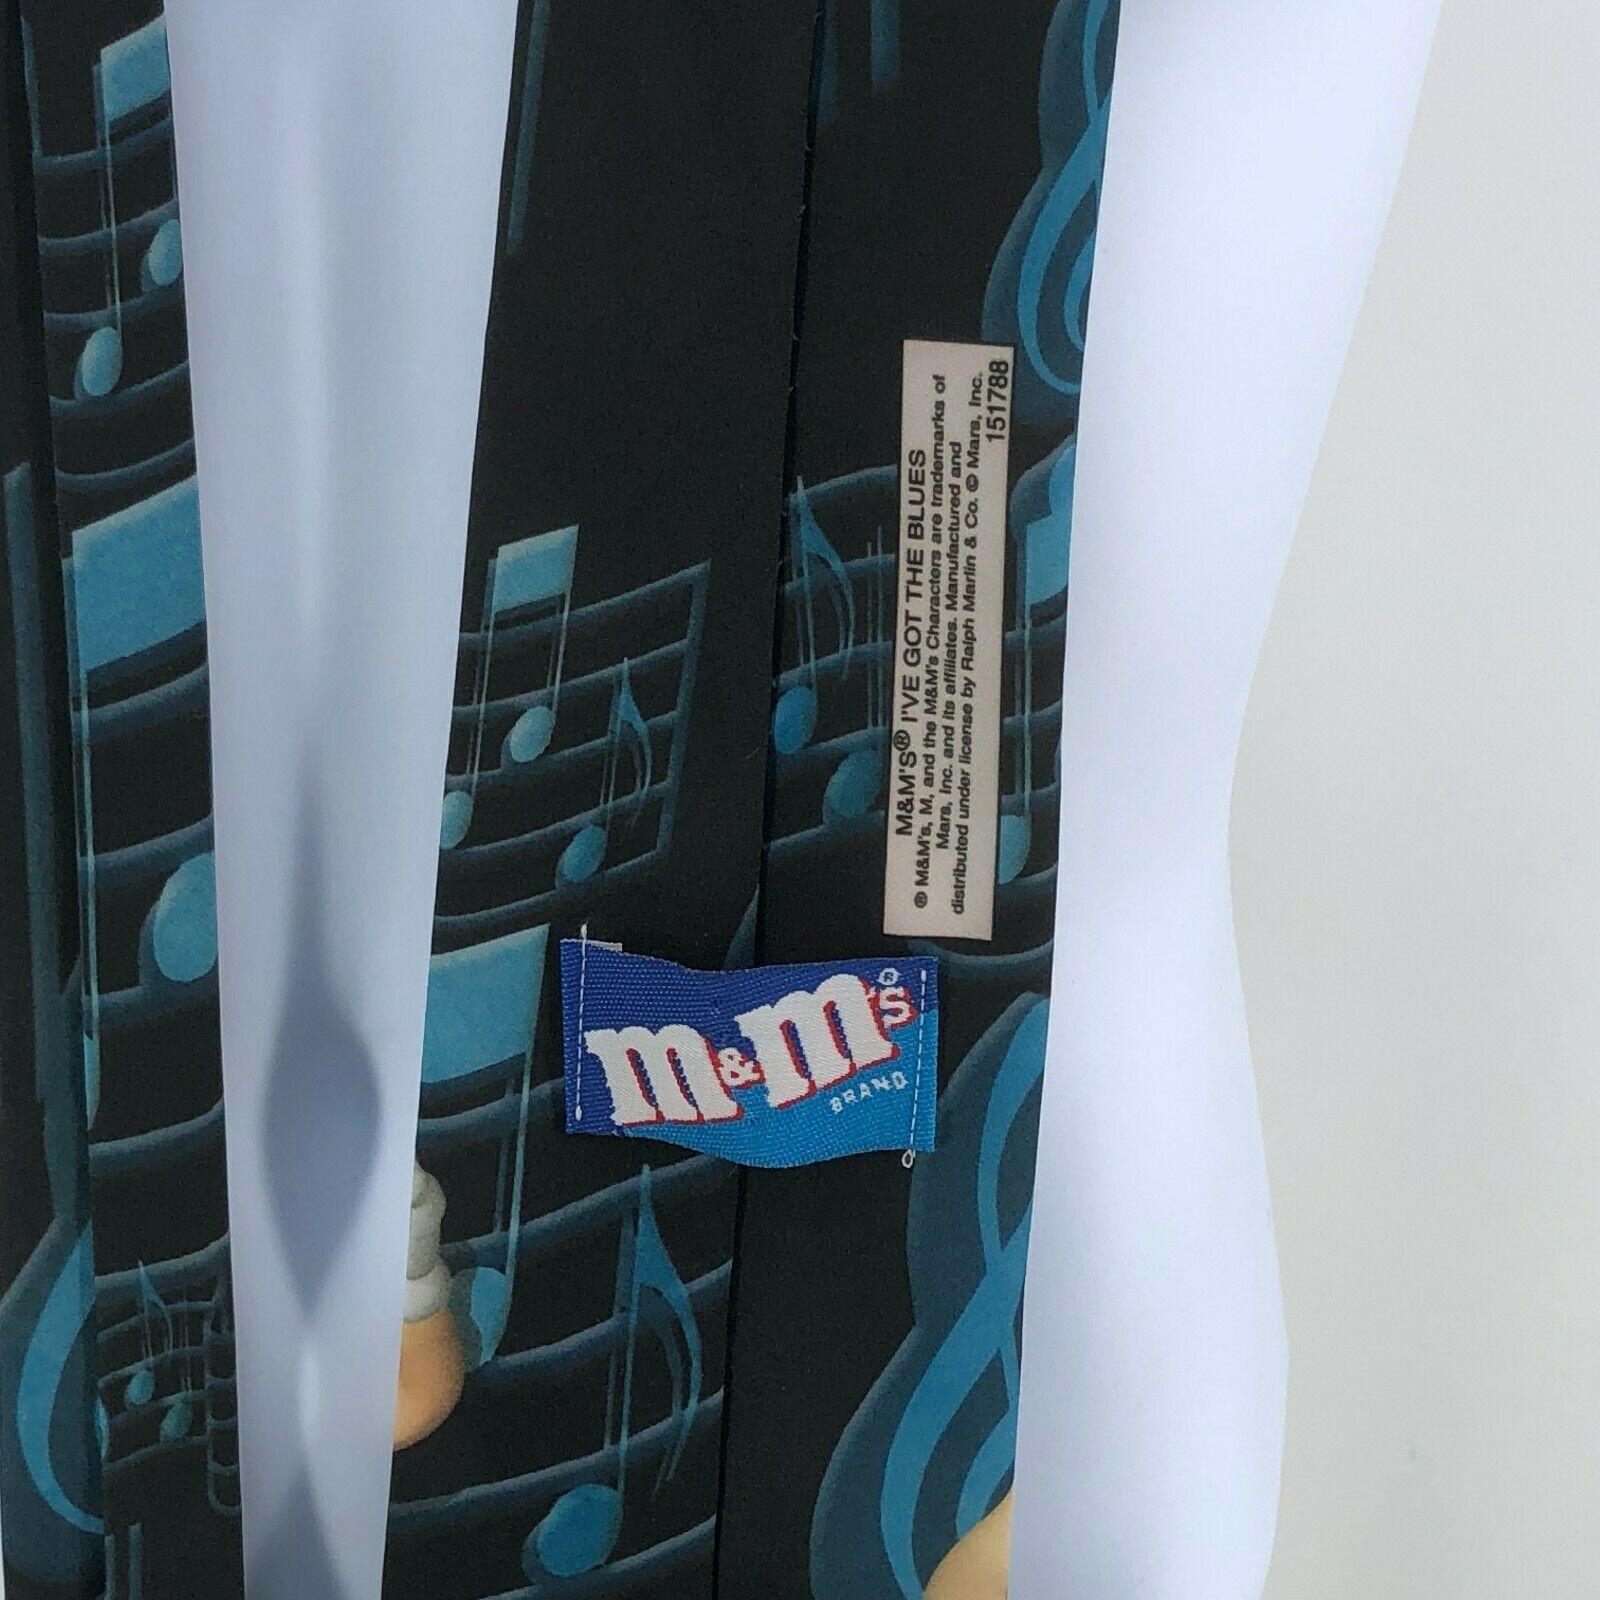 Vintage Whimsical M&Ms Candy I've Got The Blues Novelty Neck Tie USA Made  image 4